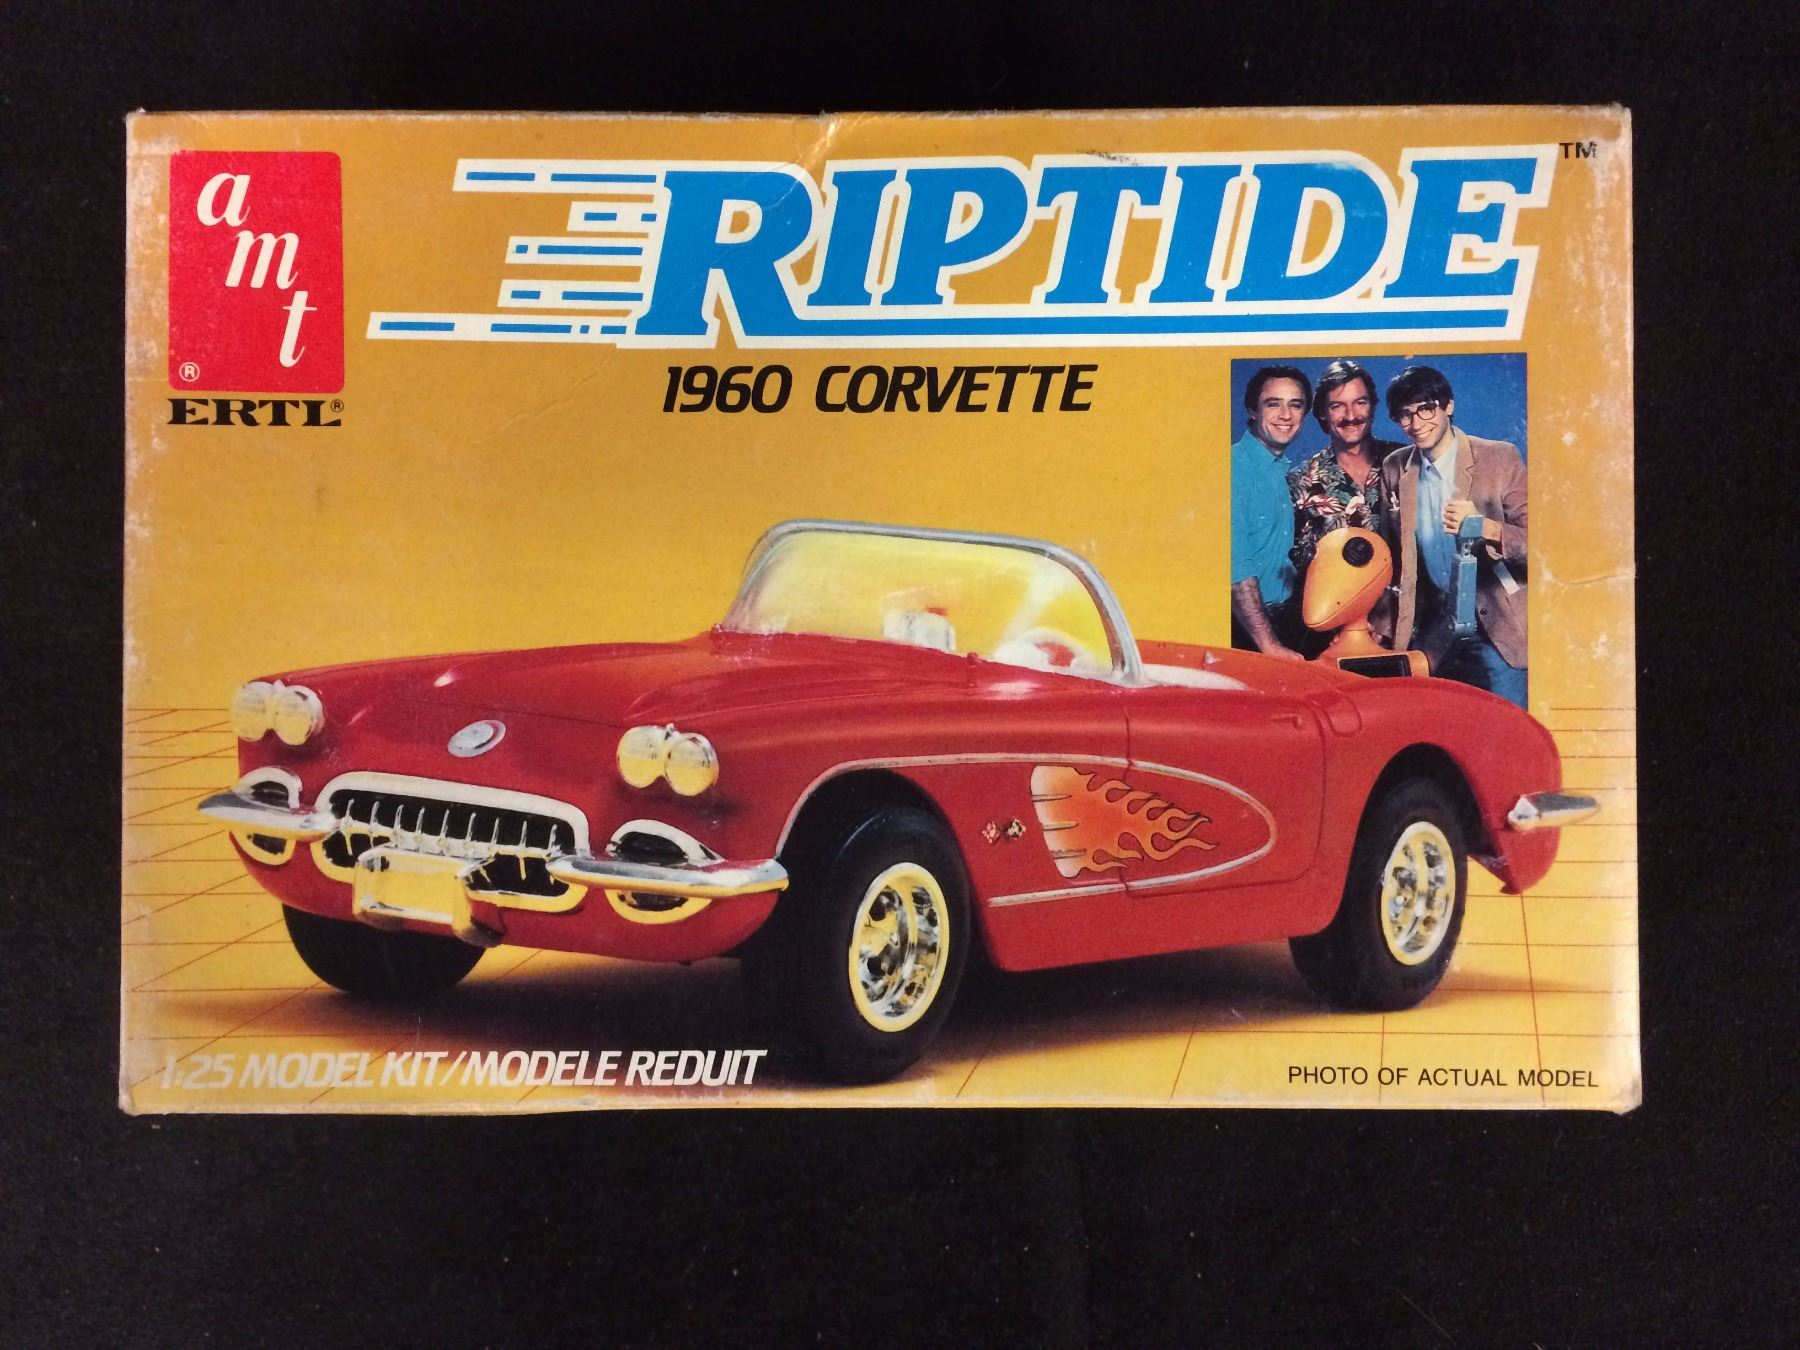 Image result for amt riptide corvette